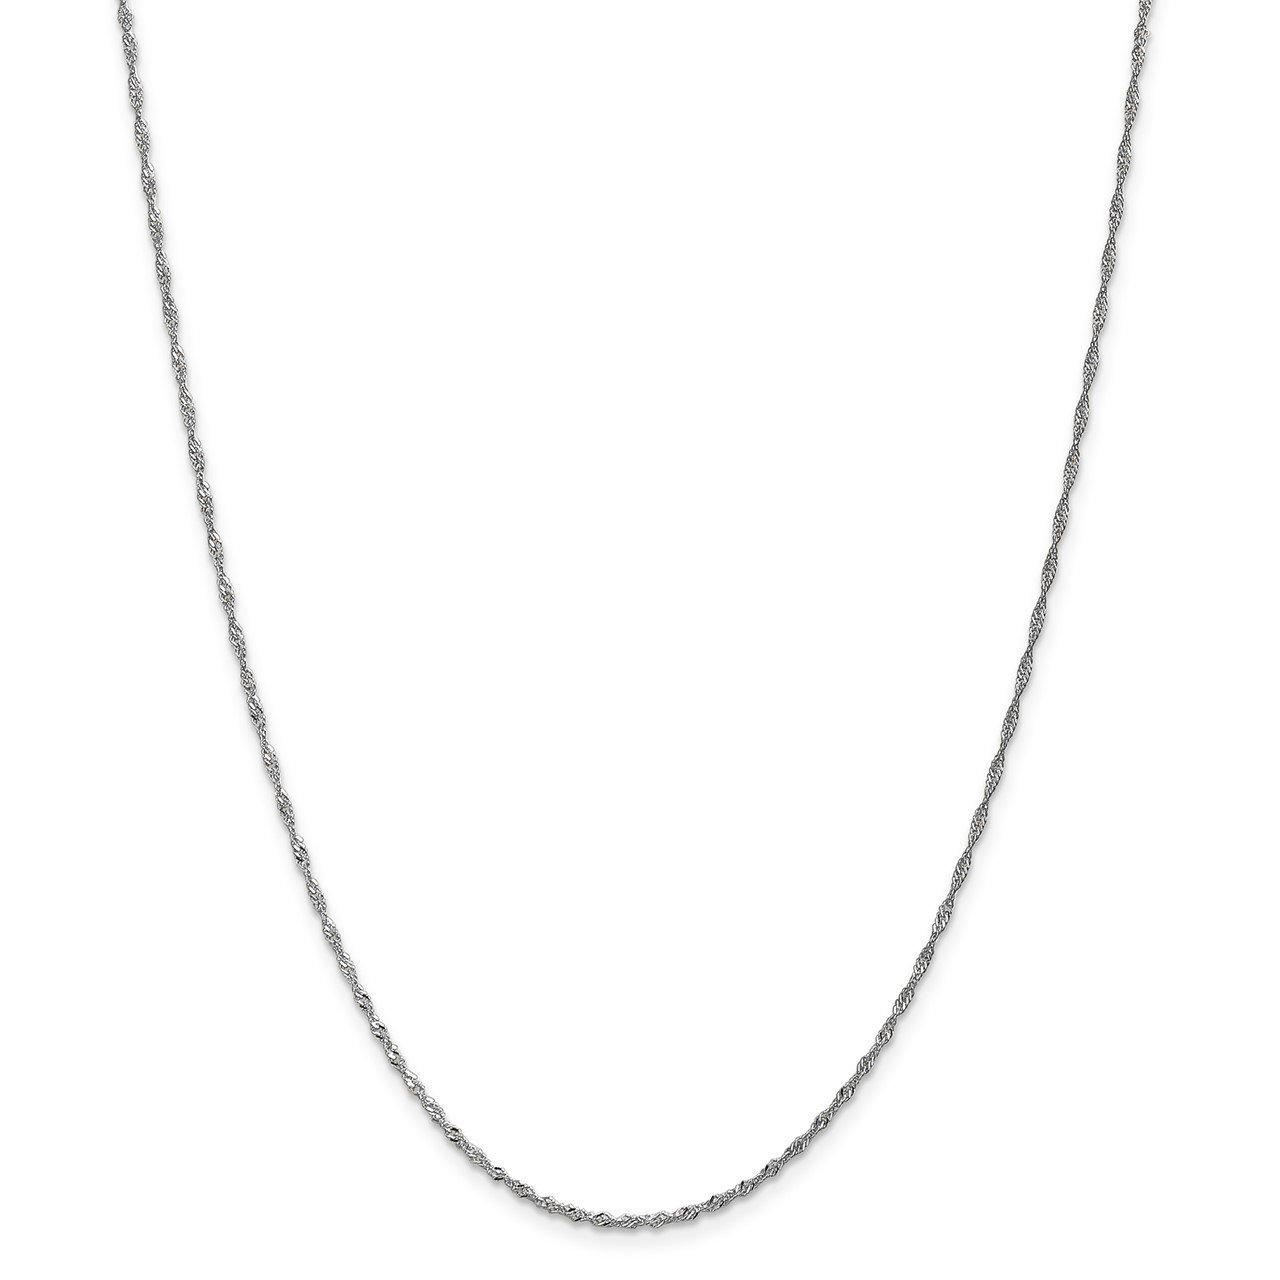 Leslie's 14K White Gold 1.3mm Singapore Chain